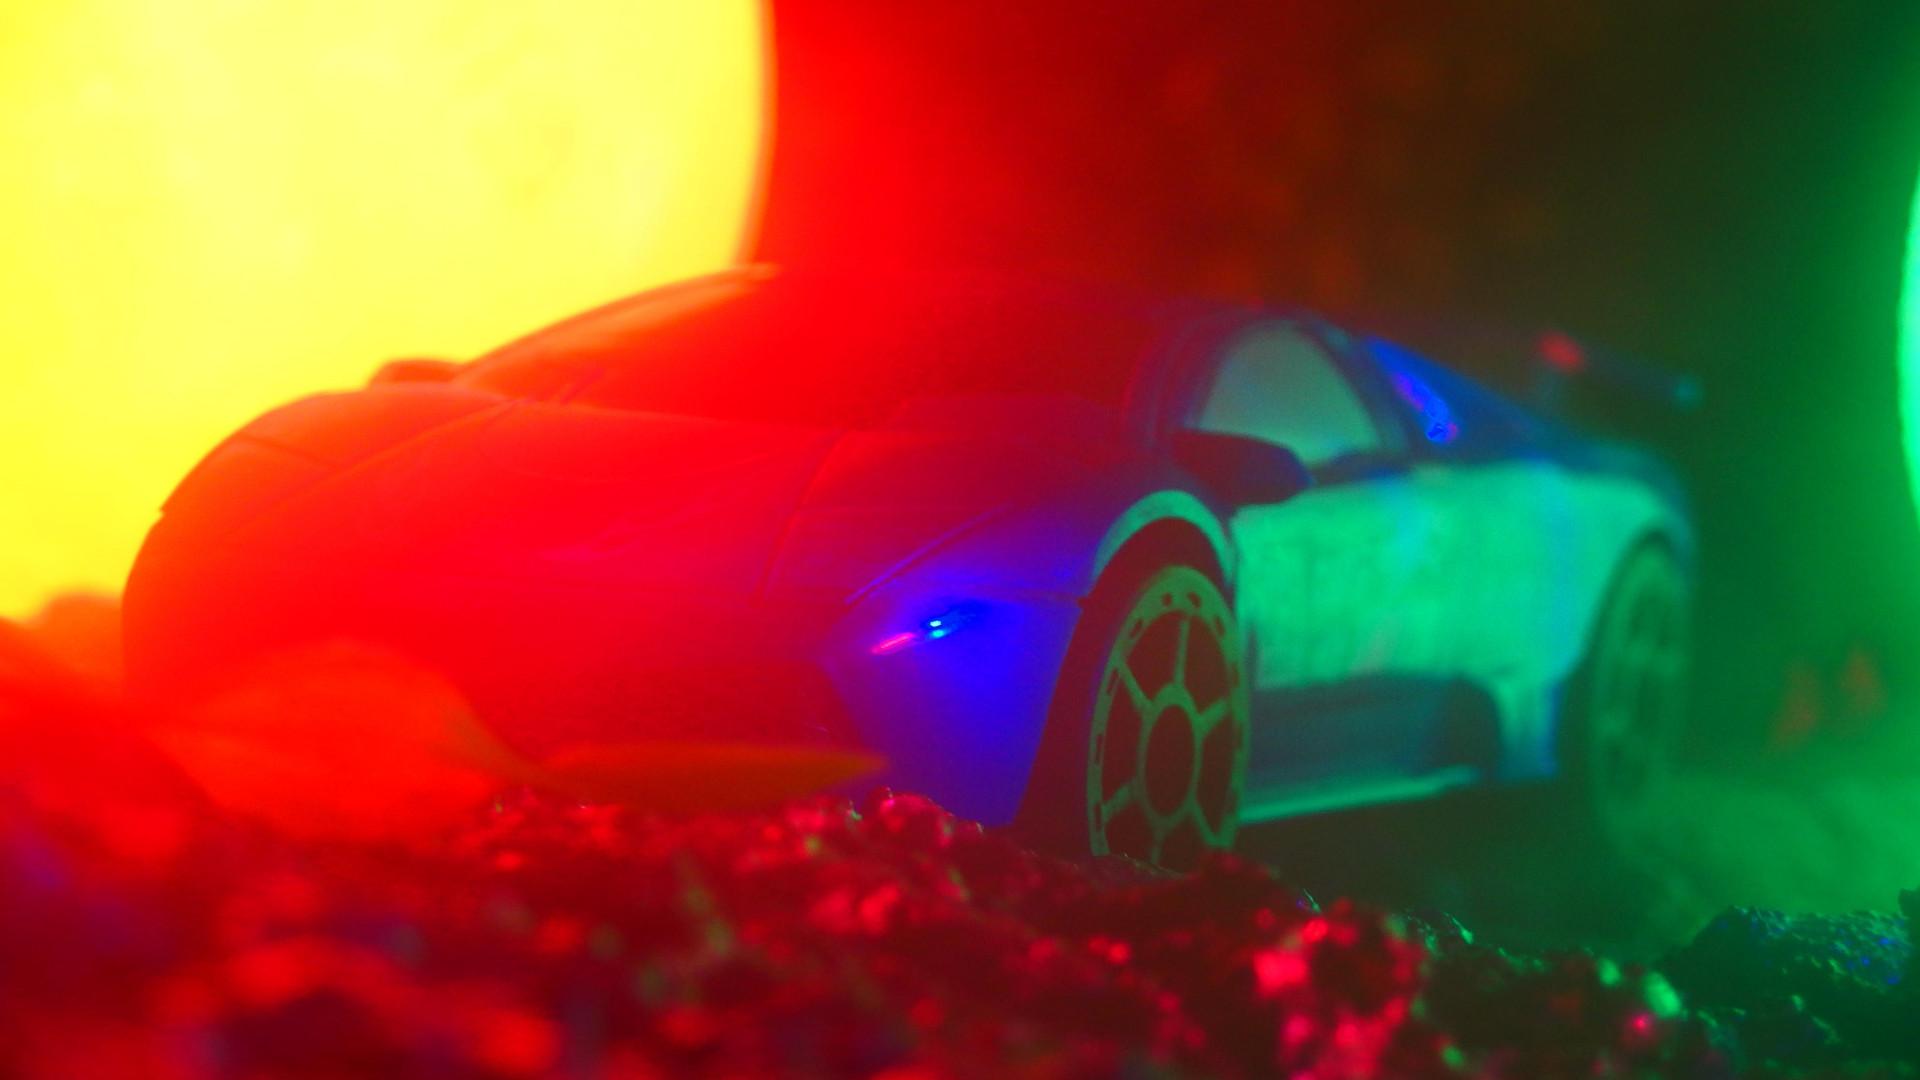 疾风战神 梓育玩具 战车模式 全新升级超炫造型 オレンジ青